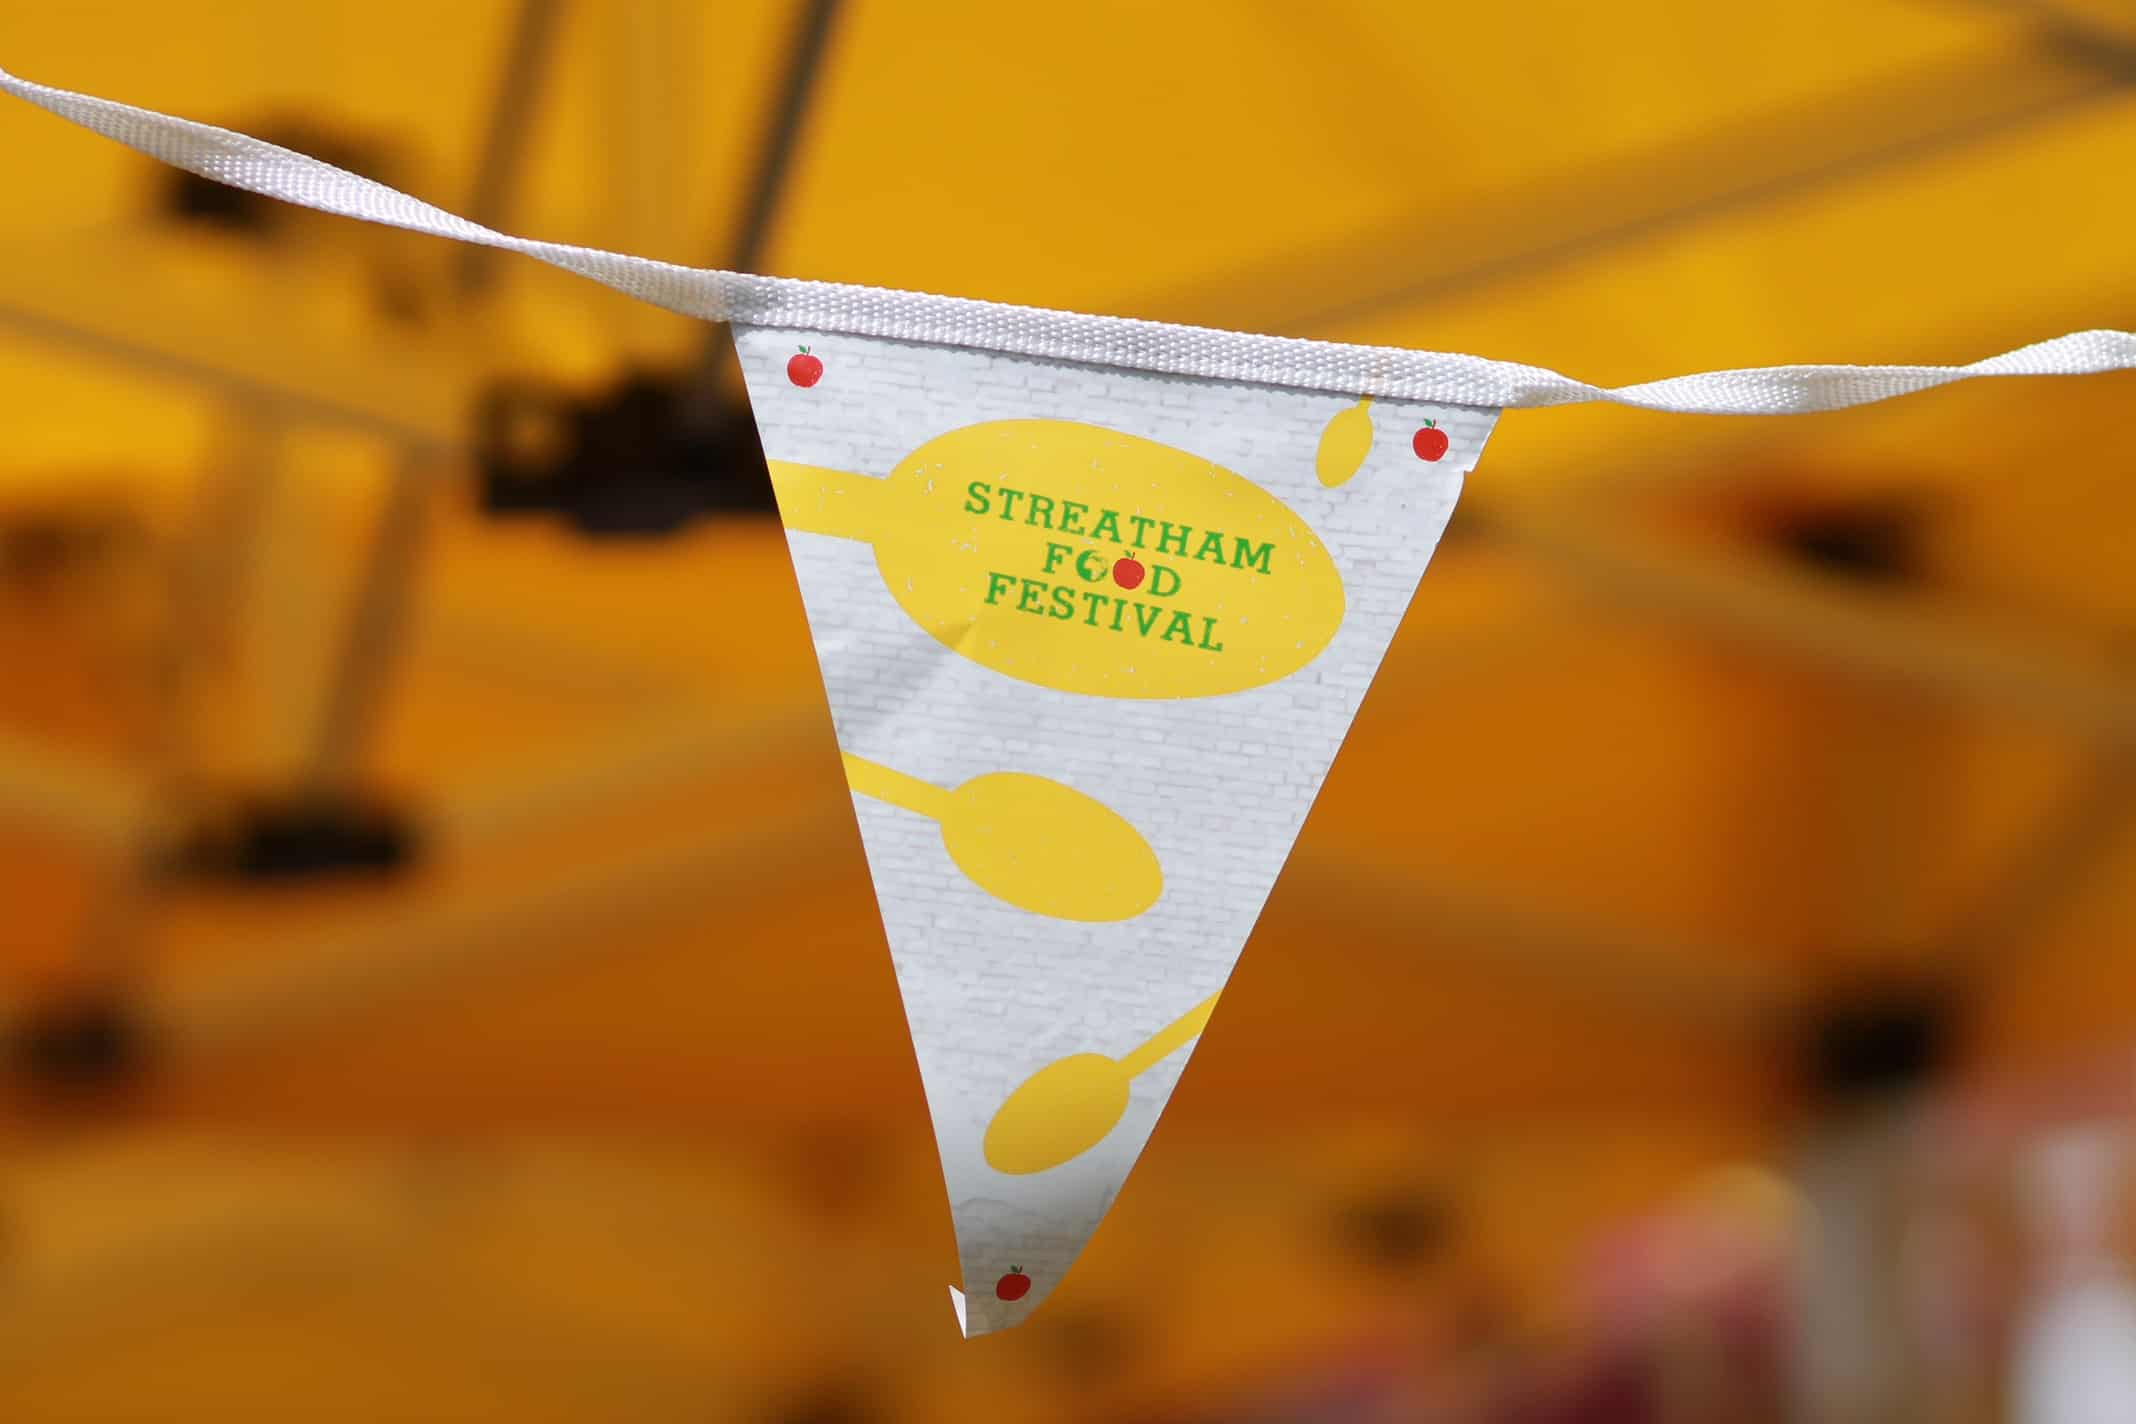 Streatham Food Festival 2020